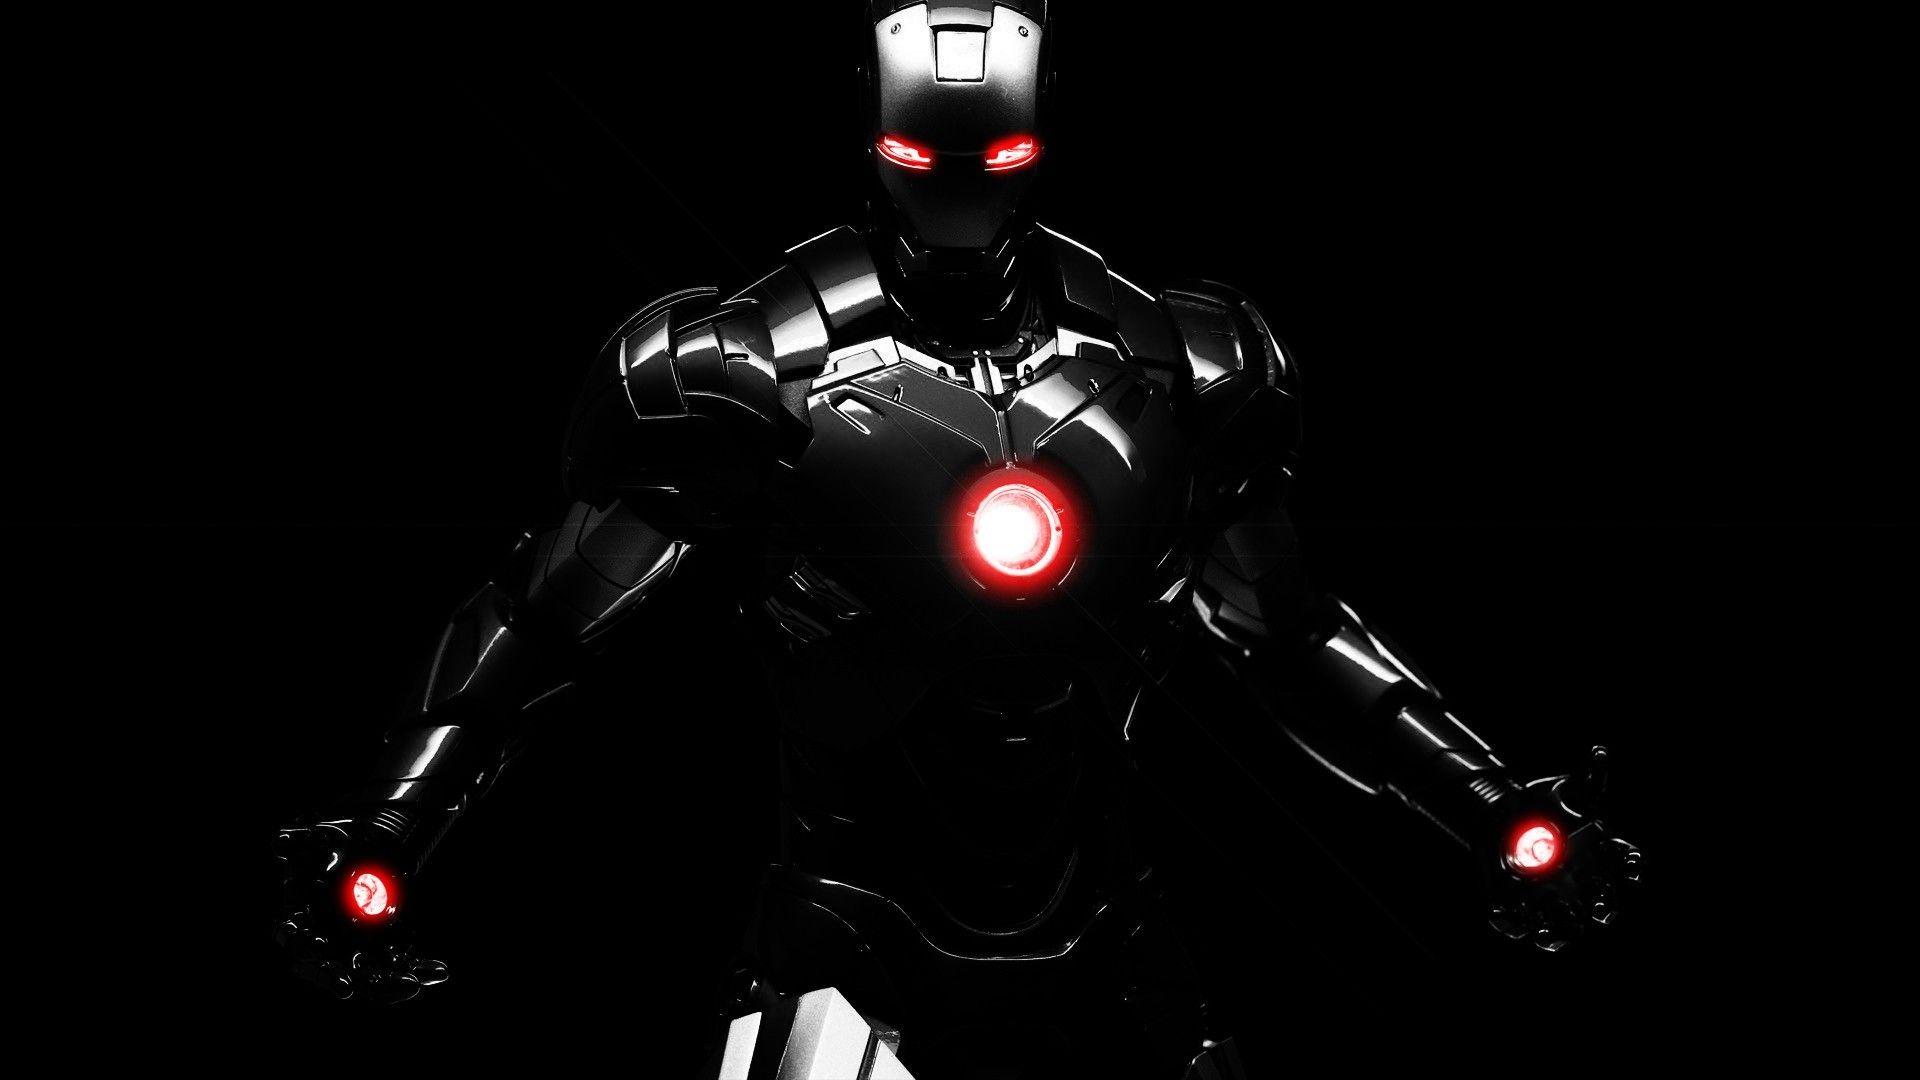 Iron Man, #armor, #render, #simple background, #digital art